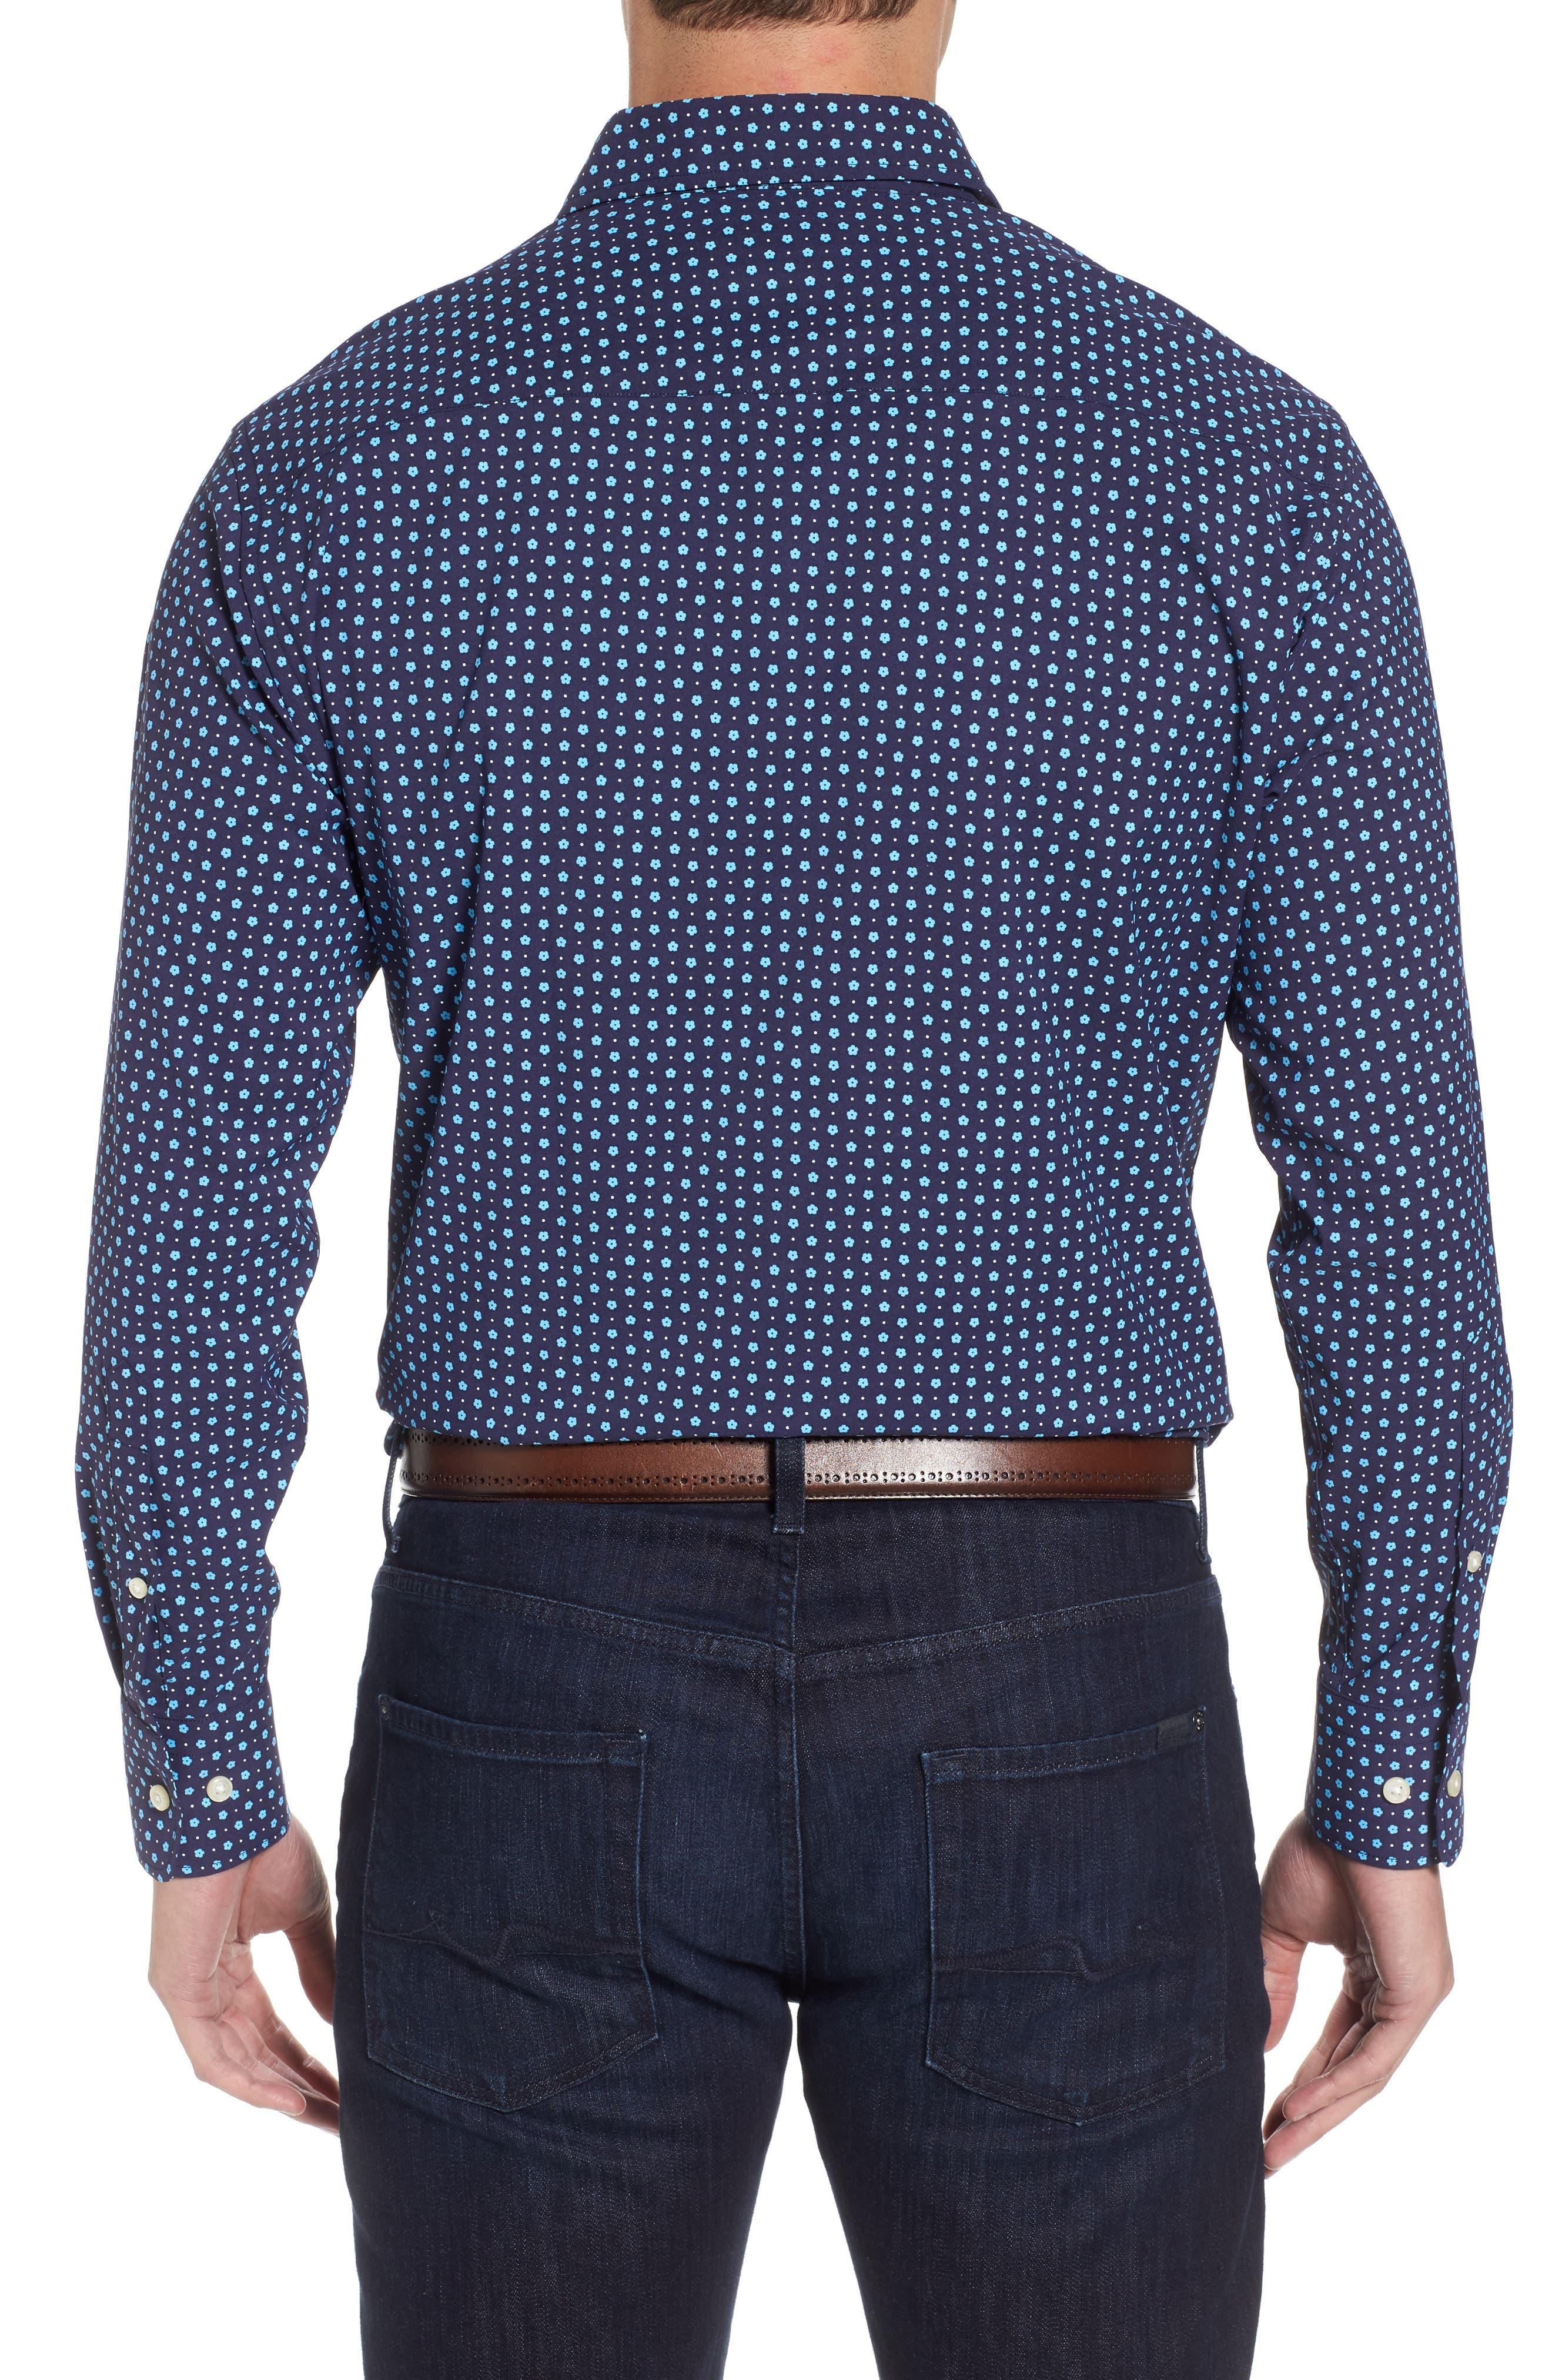 Jennings Regular Fit Floral Dot Performance Sport Shirt,                             Alternate thumbnail 2, color,                             Yankee Blue